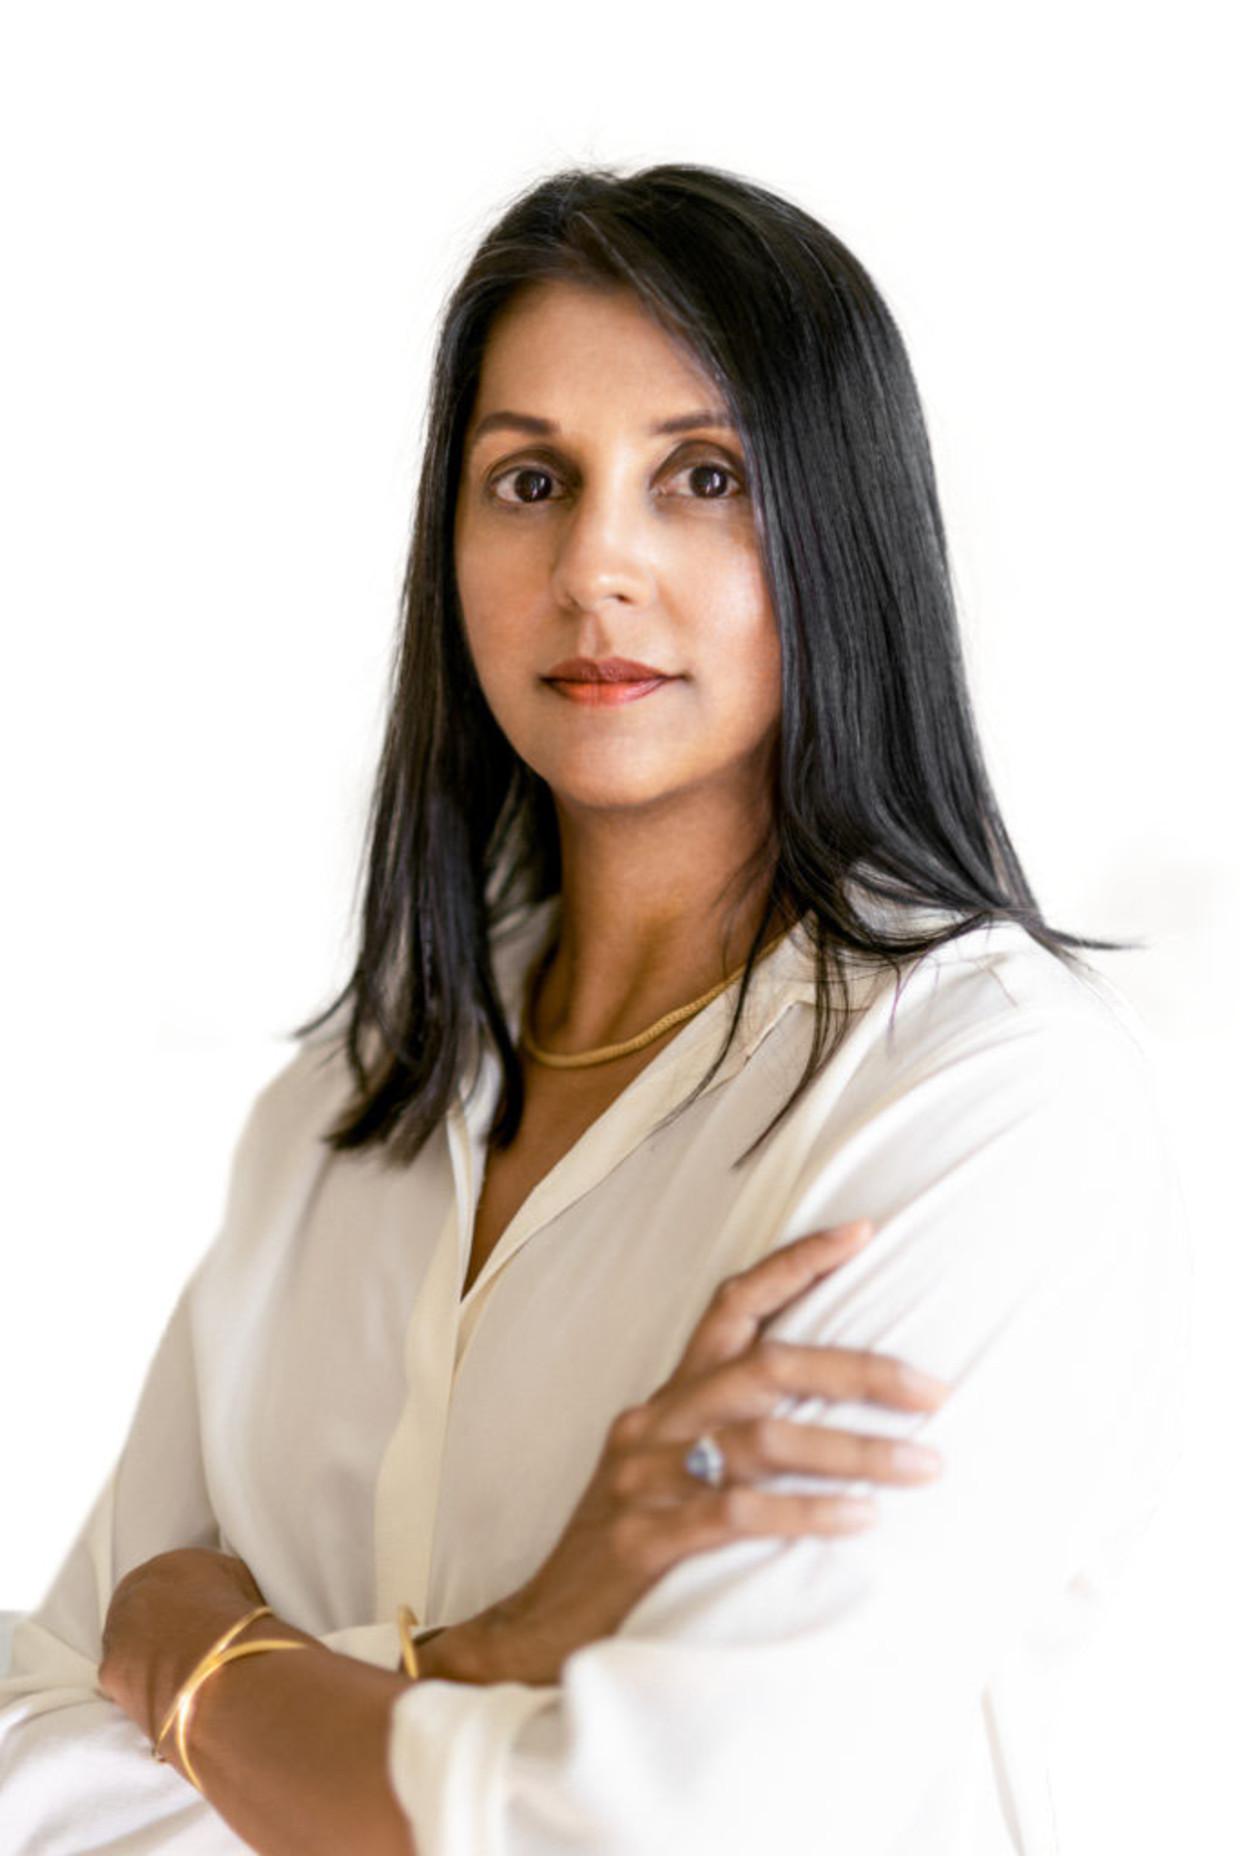 Sonia Shah Beeld Glenford Nunez